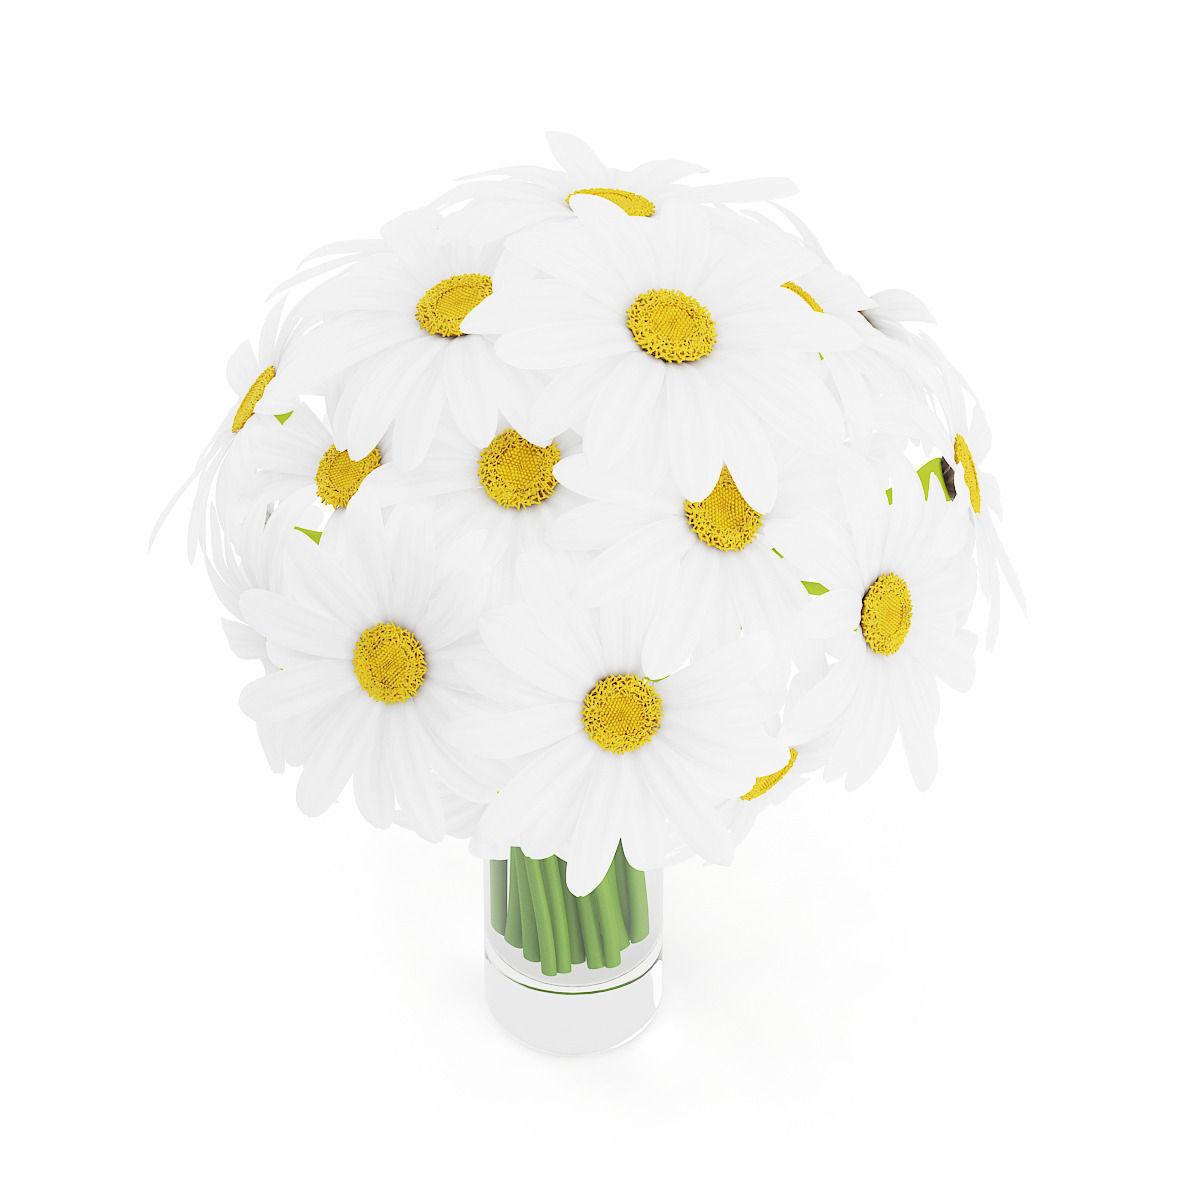 Daisies in glass vase 3d cgtrader daisies in glass vase 3d model max obj fbx c4d mtl 1 reviewsmspy